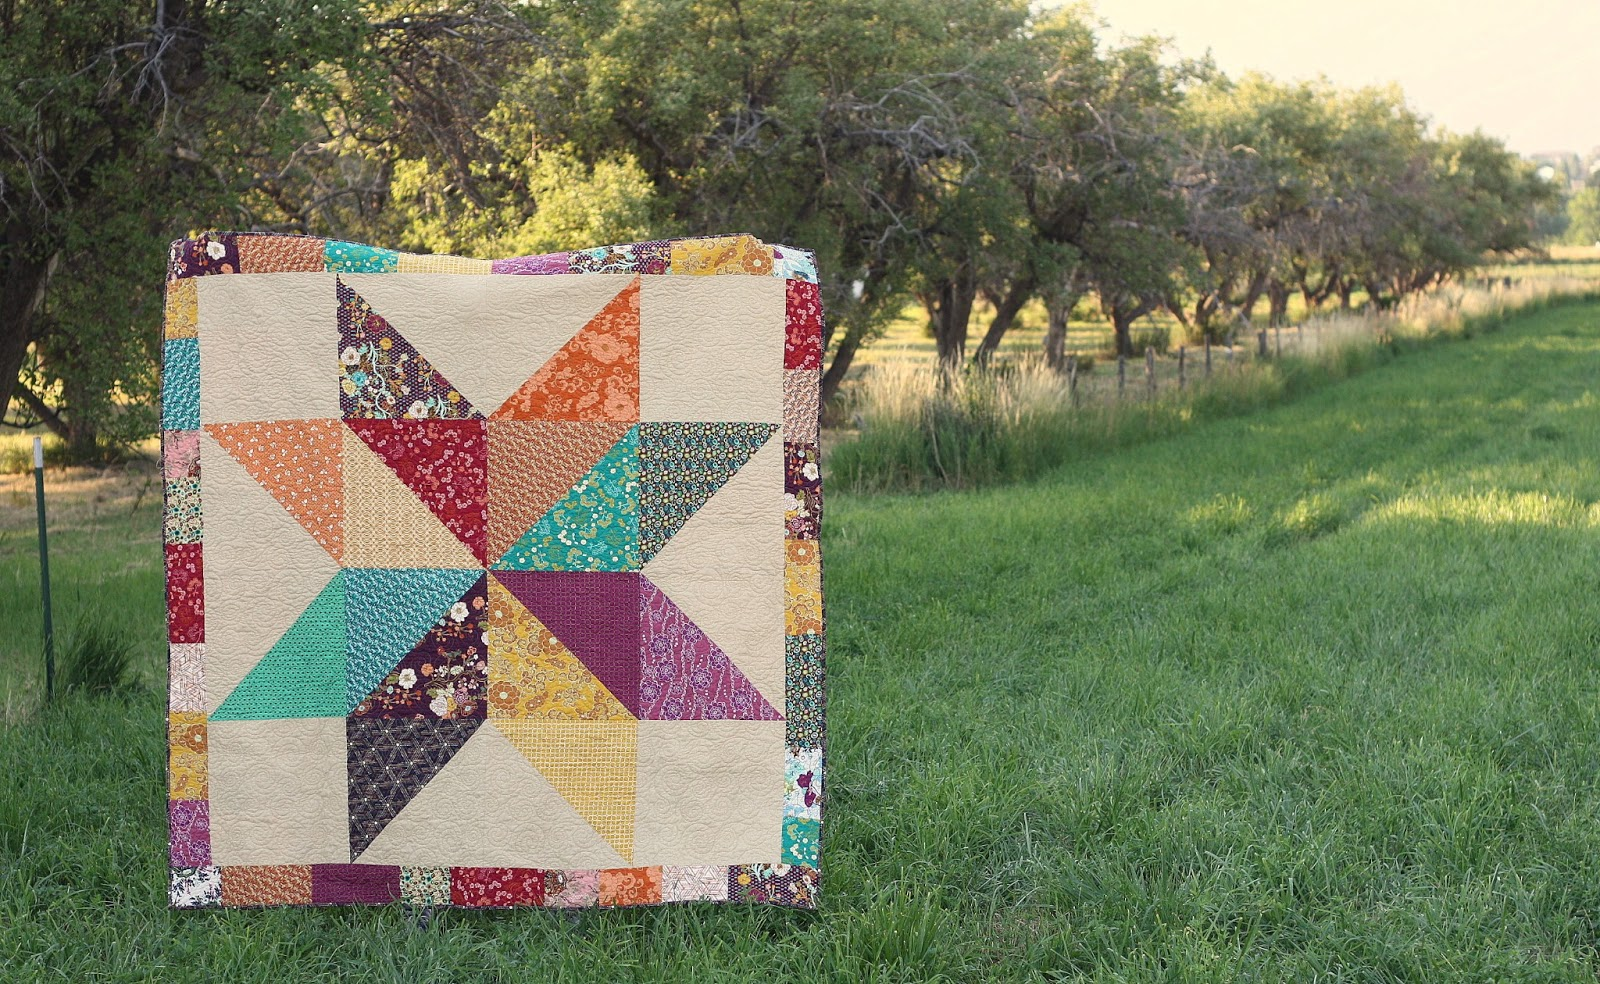 Fat Quarter Giant Star Quilt : large star quilt pattern - Adamdwight.com